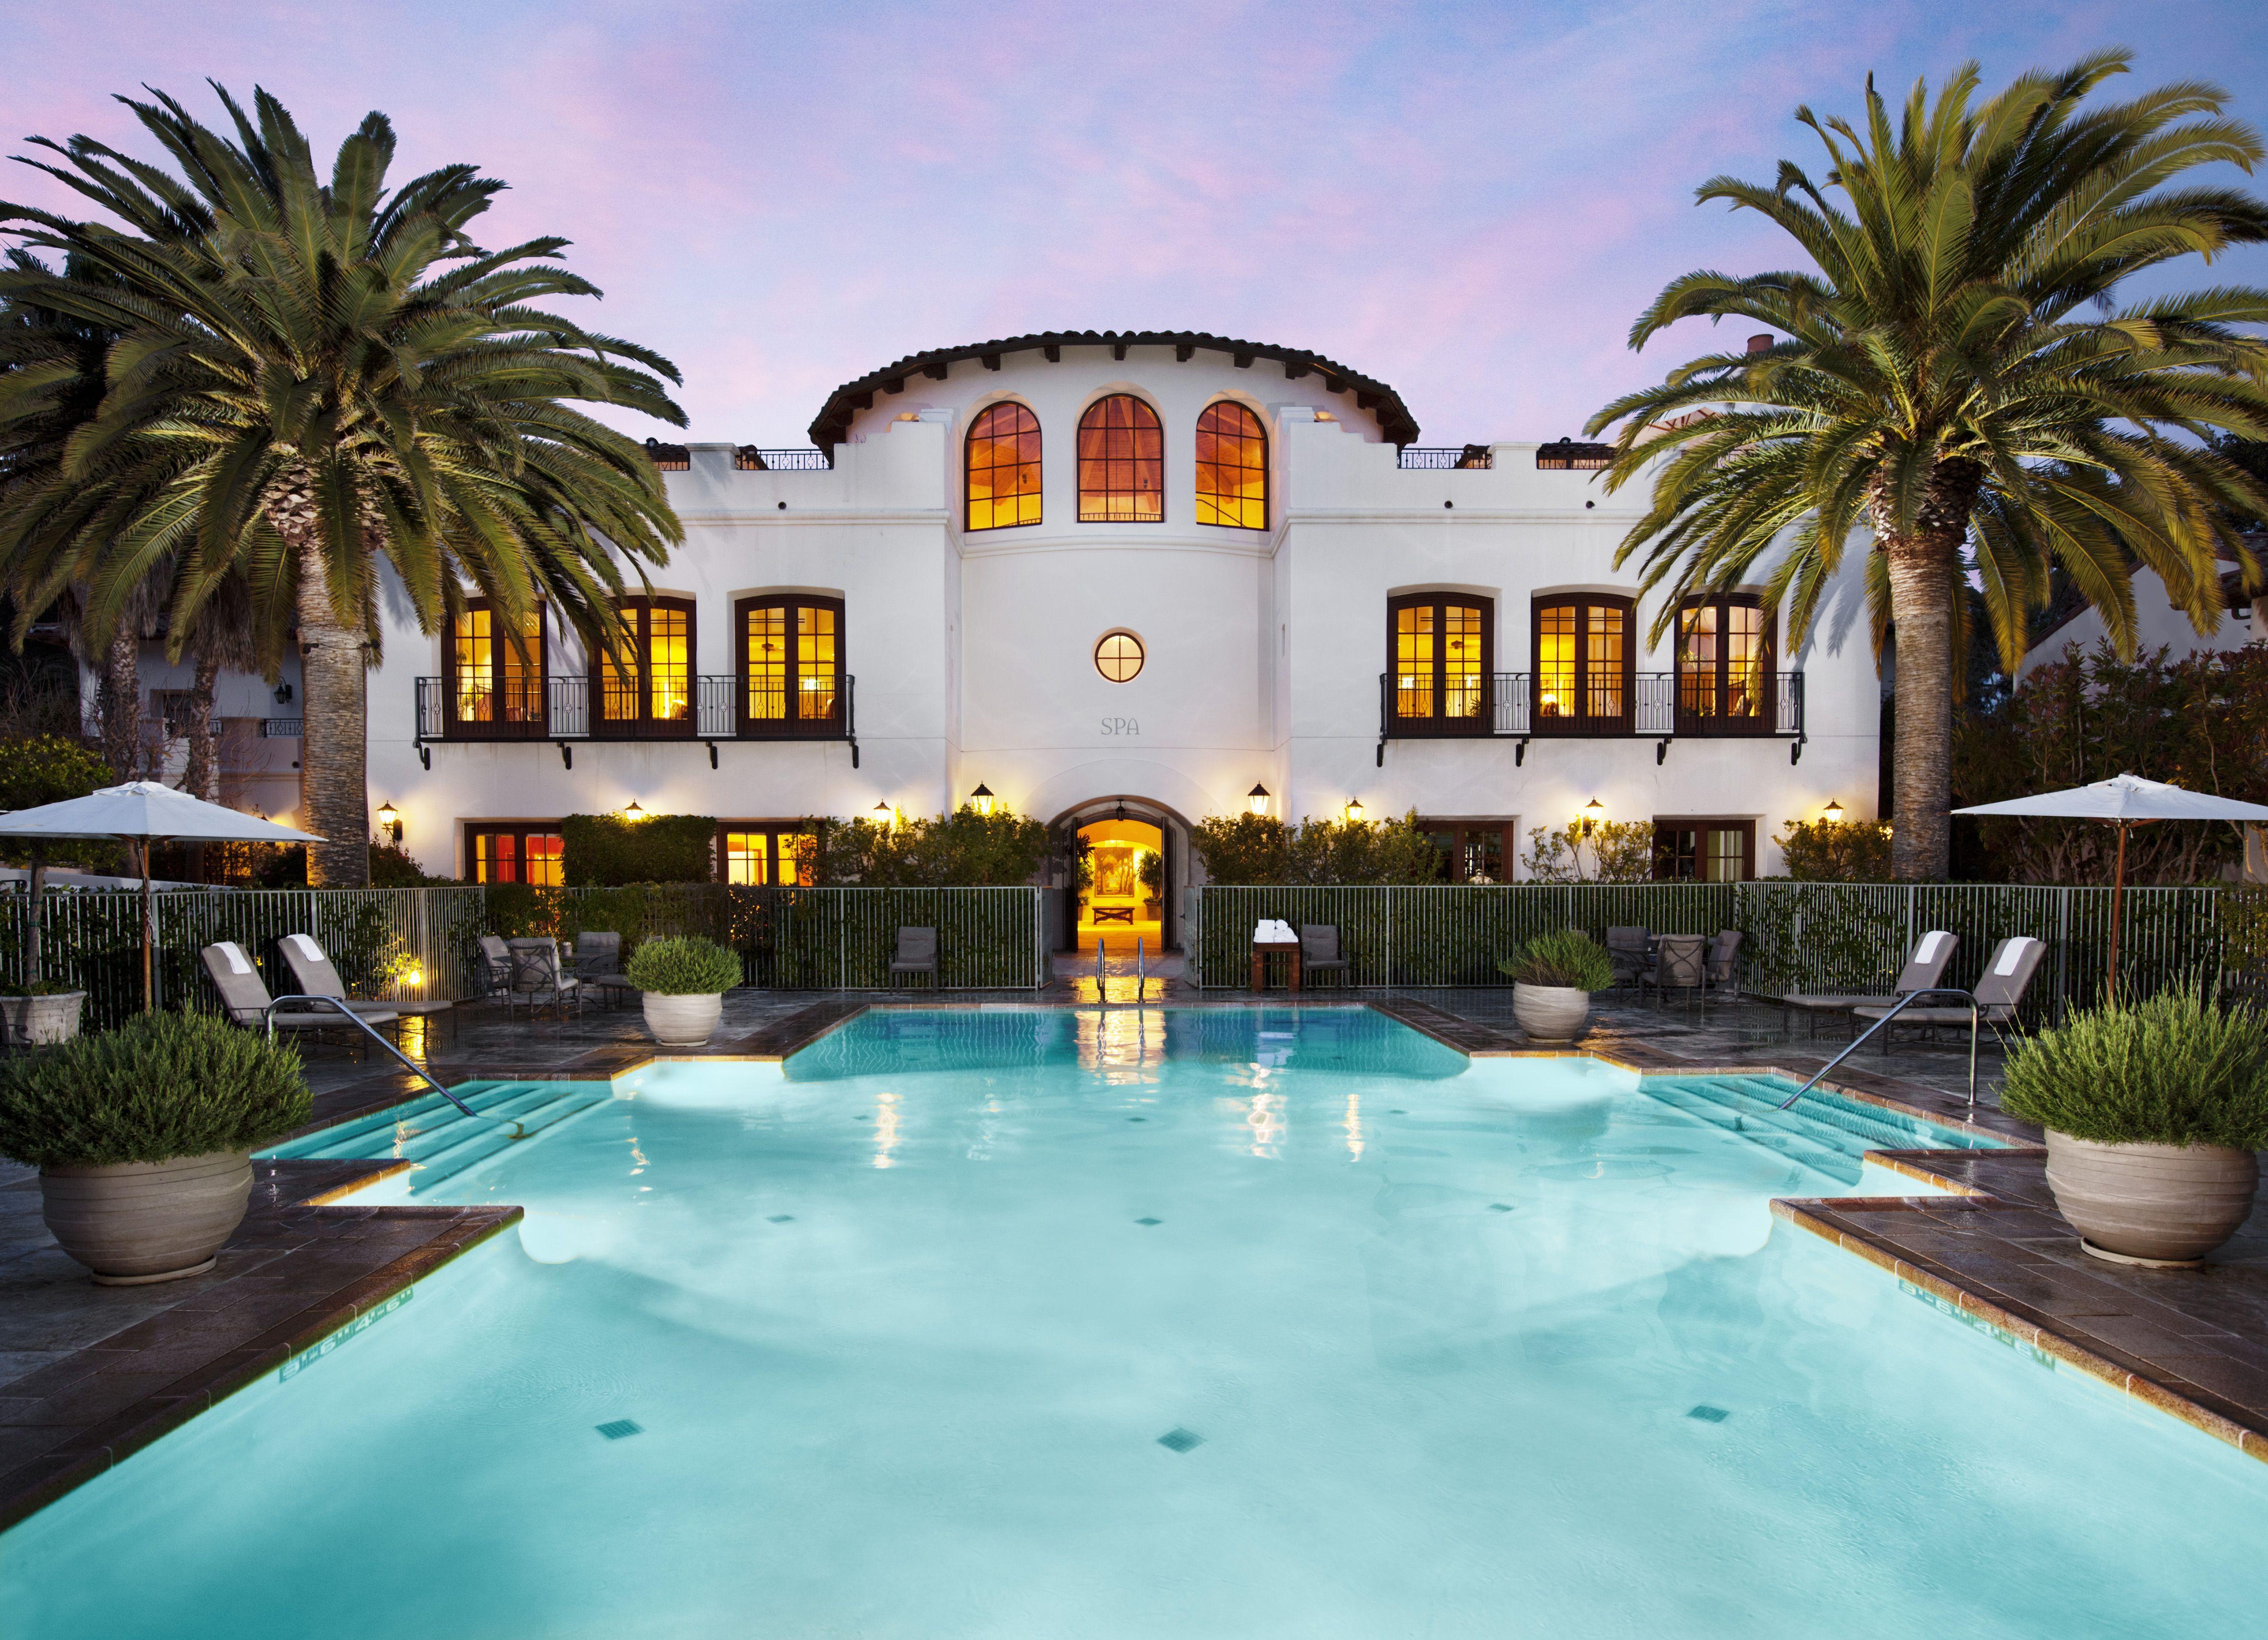 Santa Barbara Hotels Experience Laid Back Luxury And Contemporary Comfort At Bacara Resort Spa A Beachfront